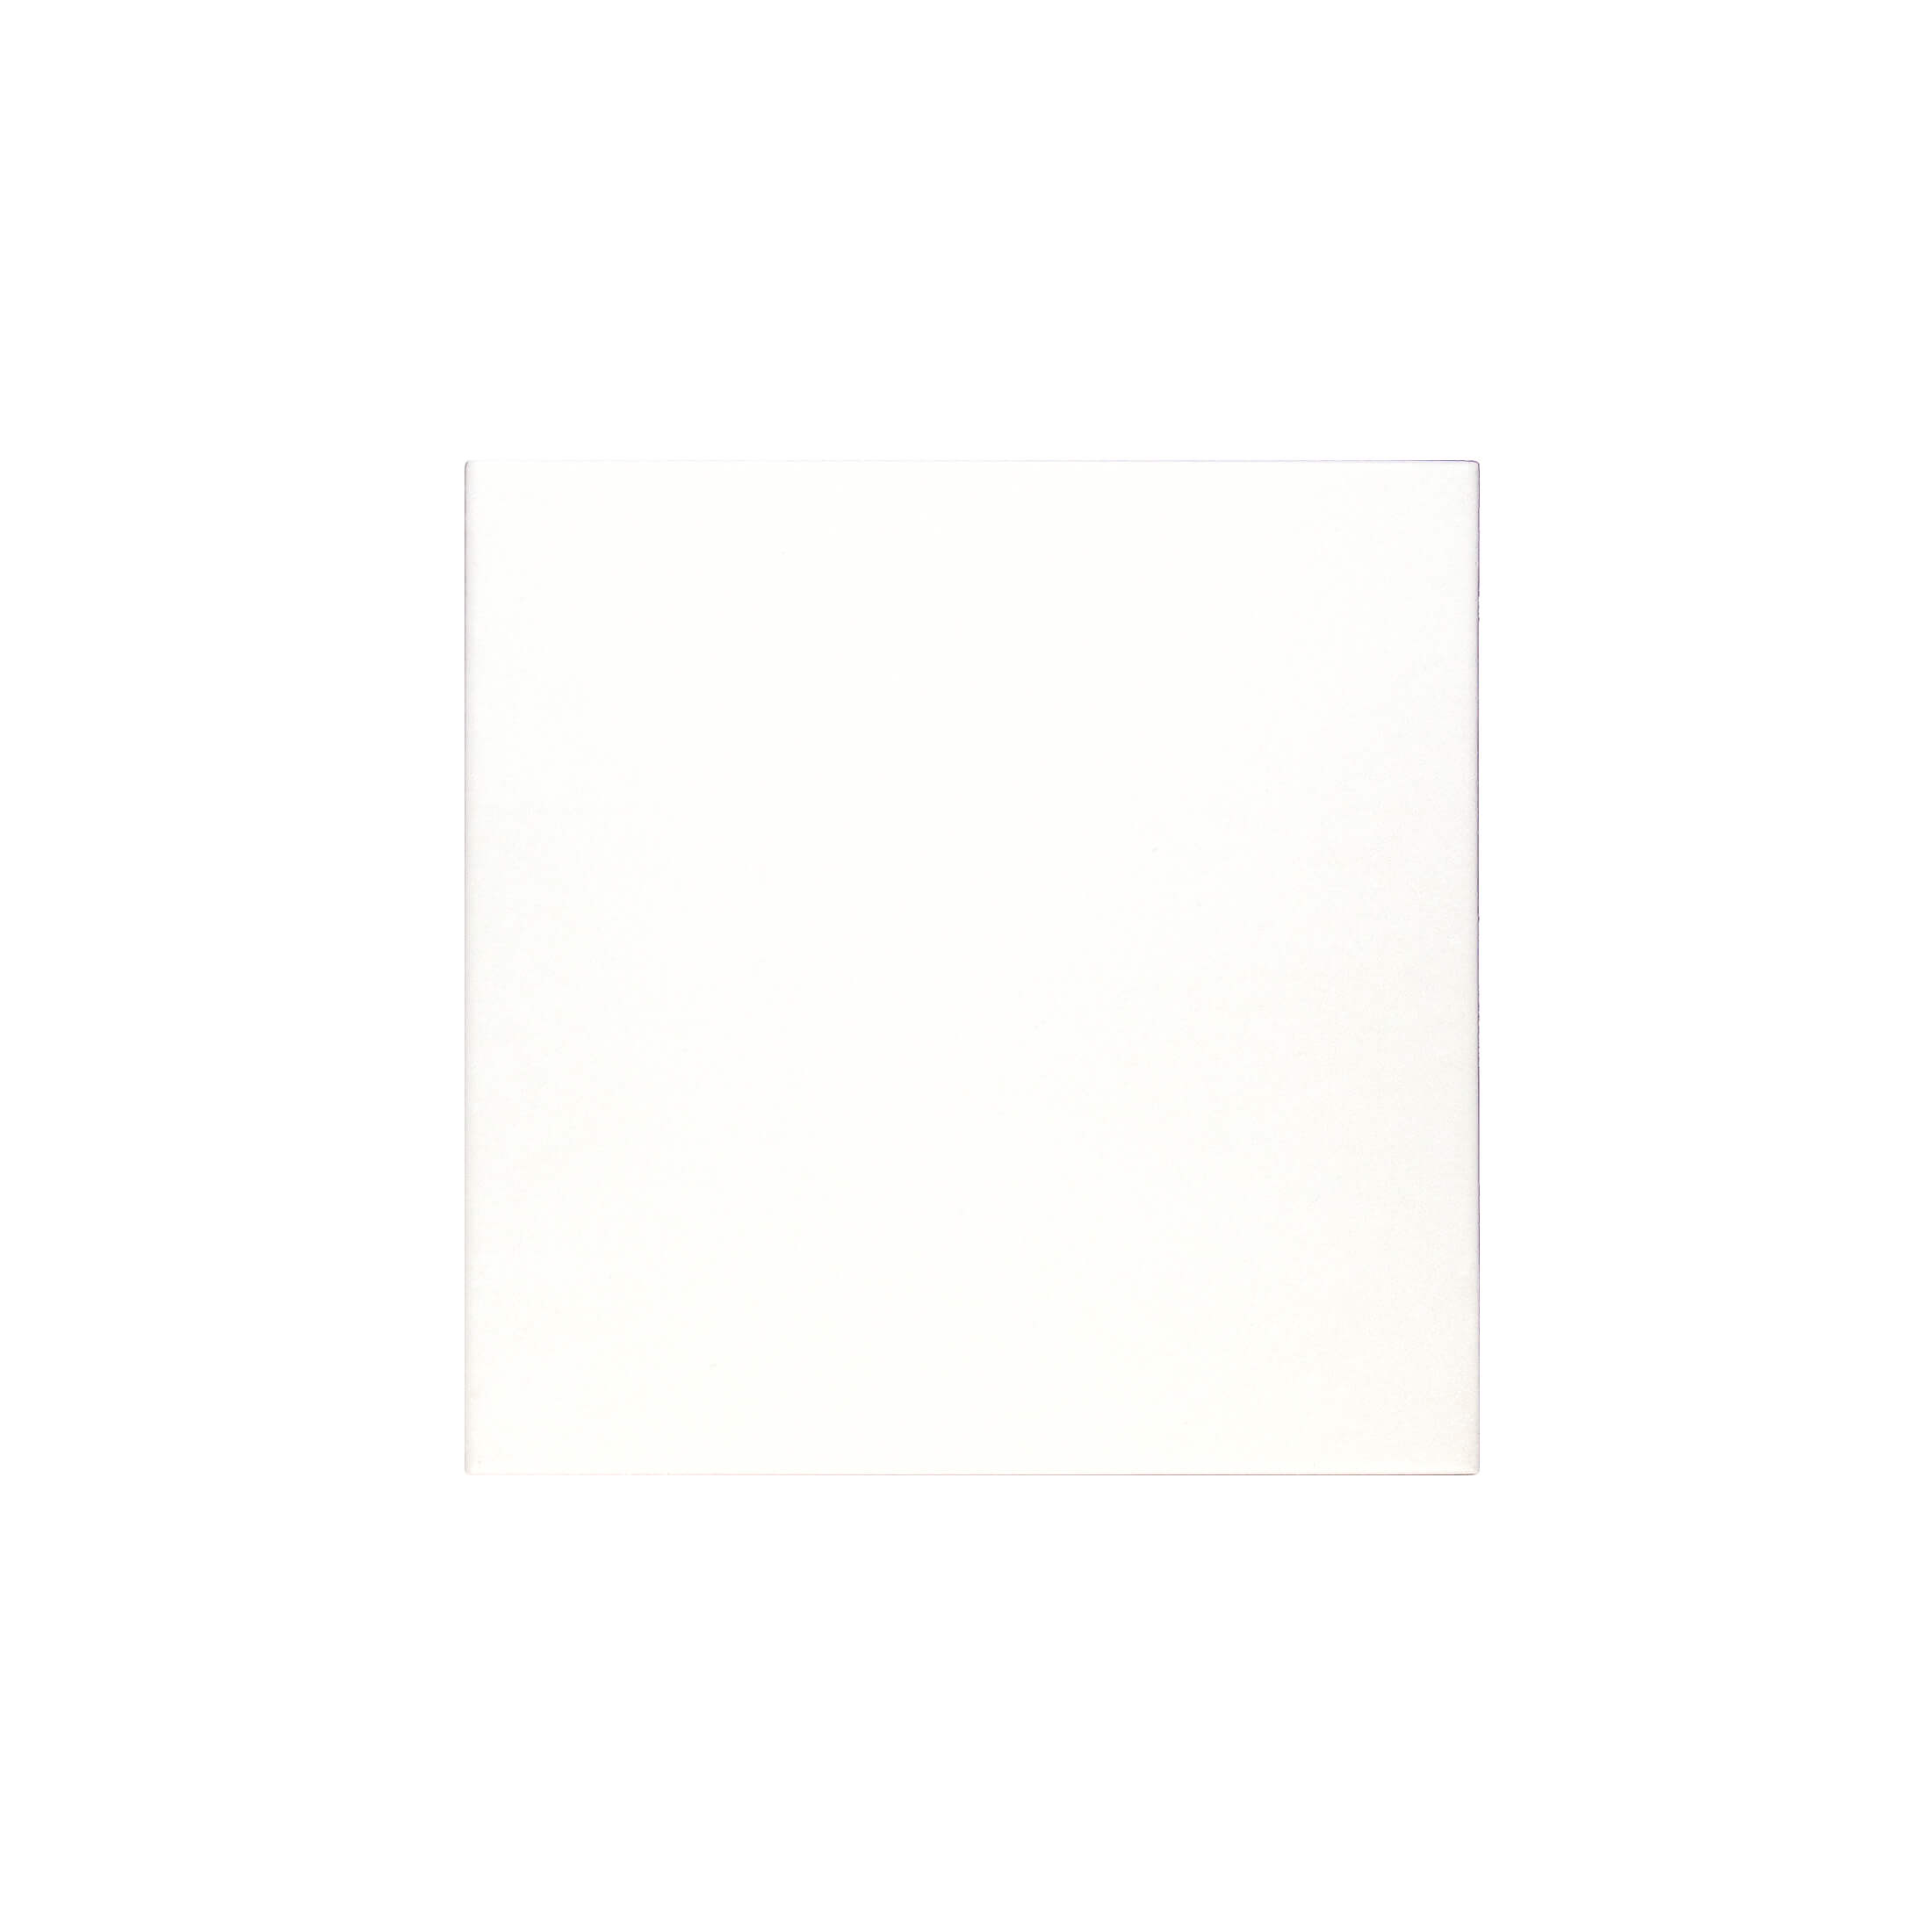 ADPV9022 - PAVIMENTO WHITE - 18.5 cm X 18.5 cm